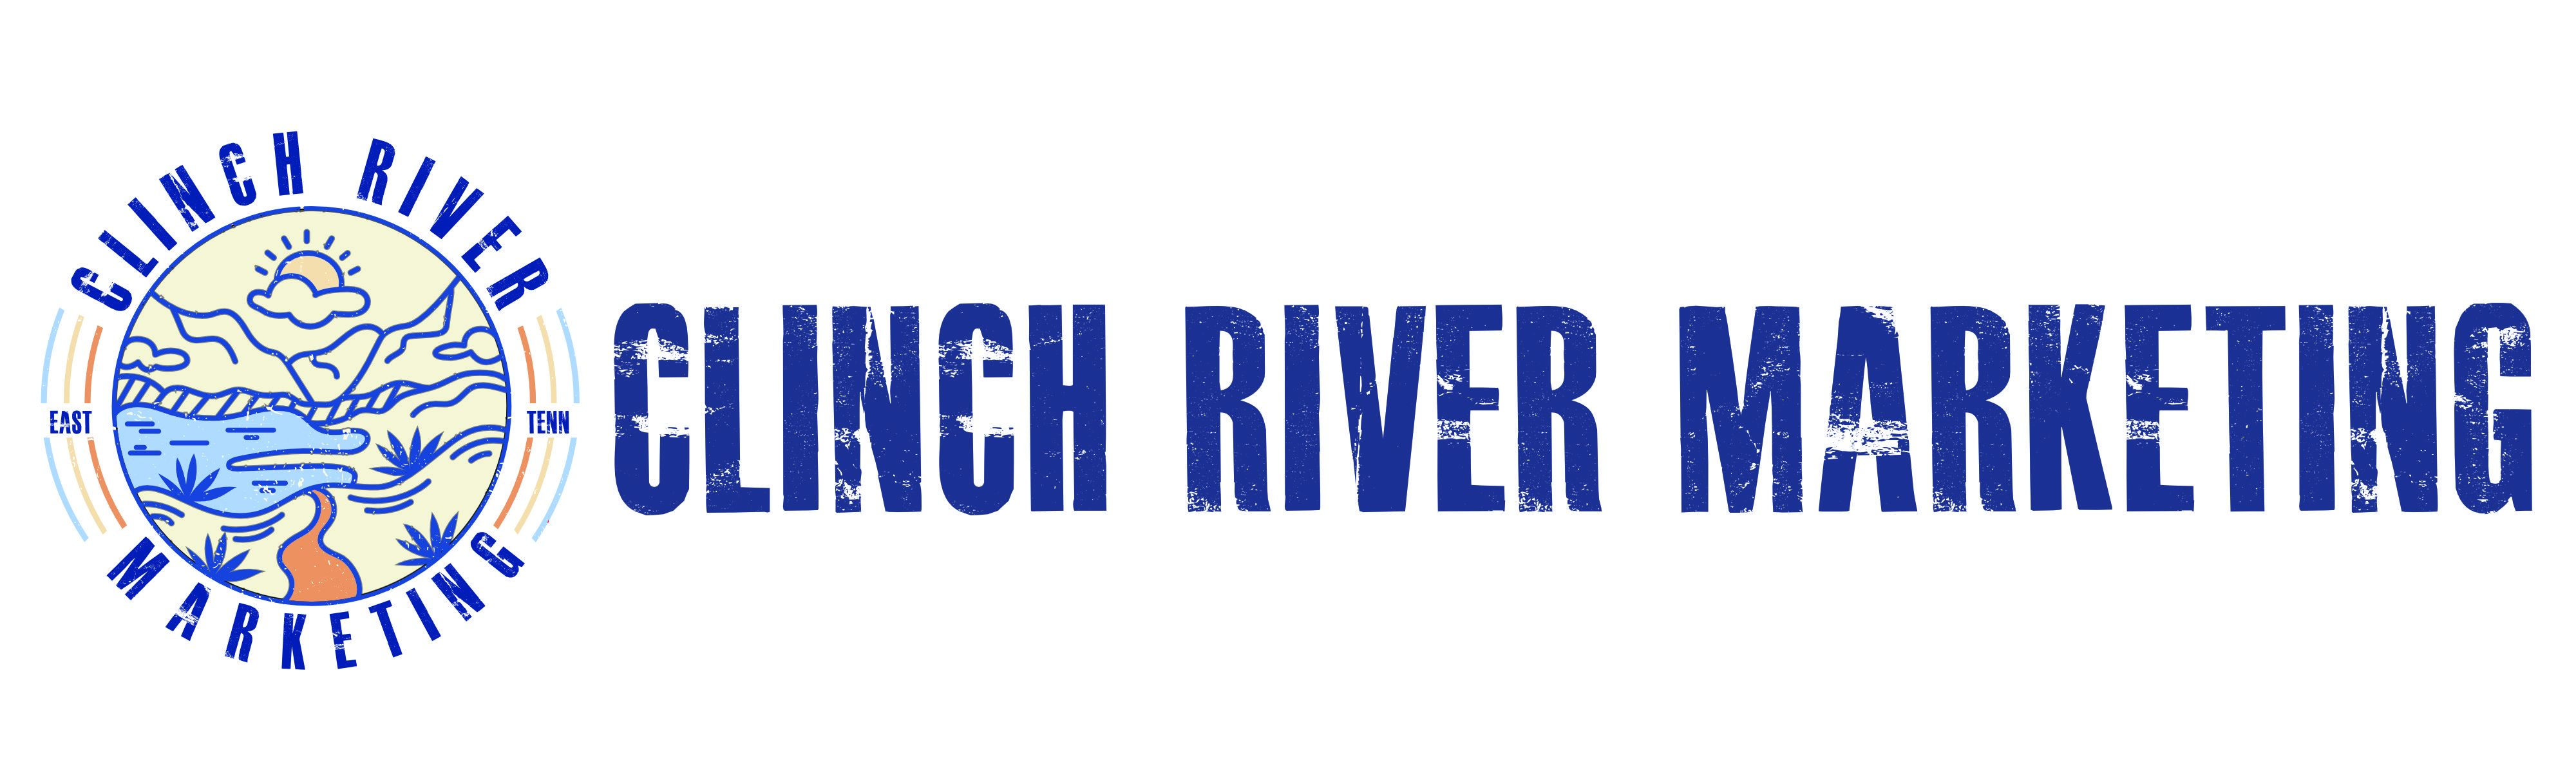 Clinch River Marketing